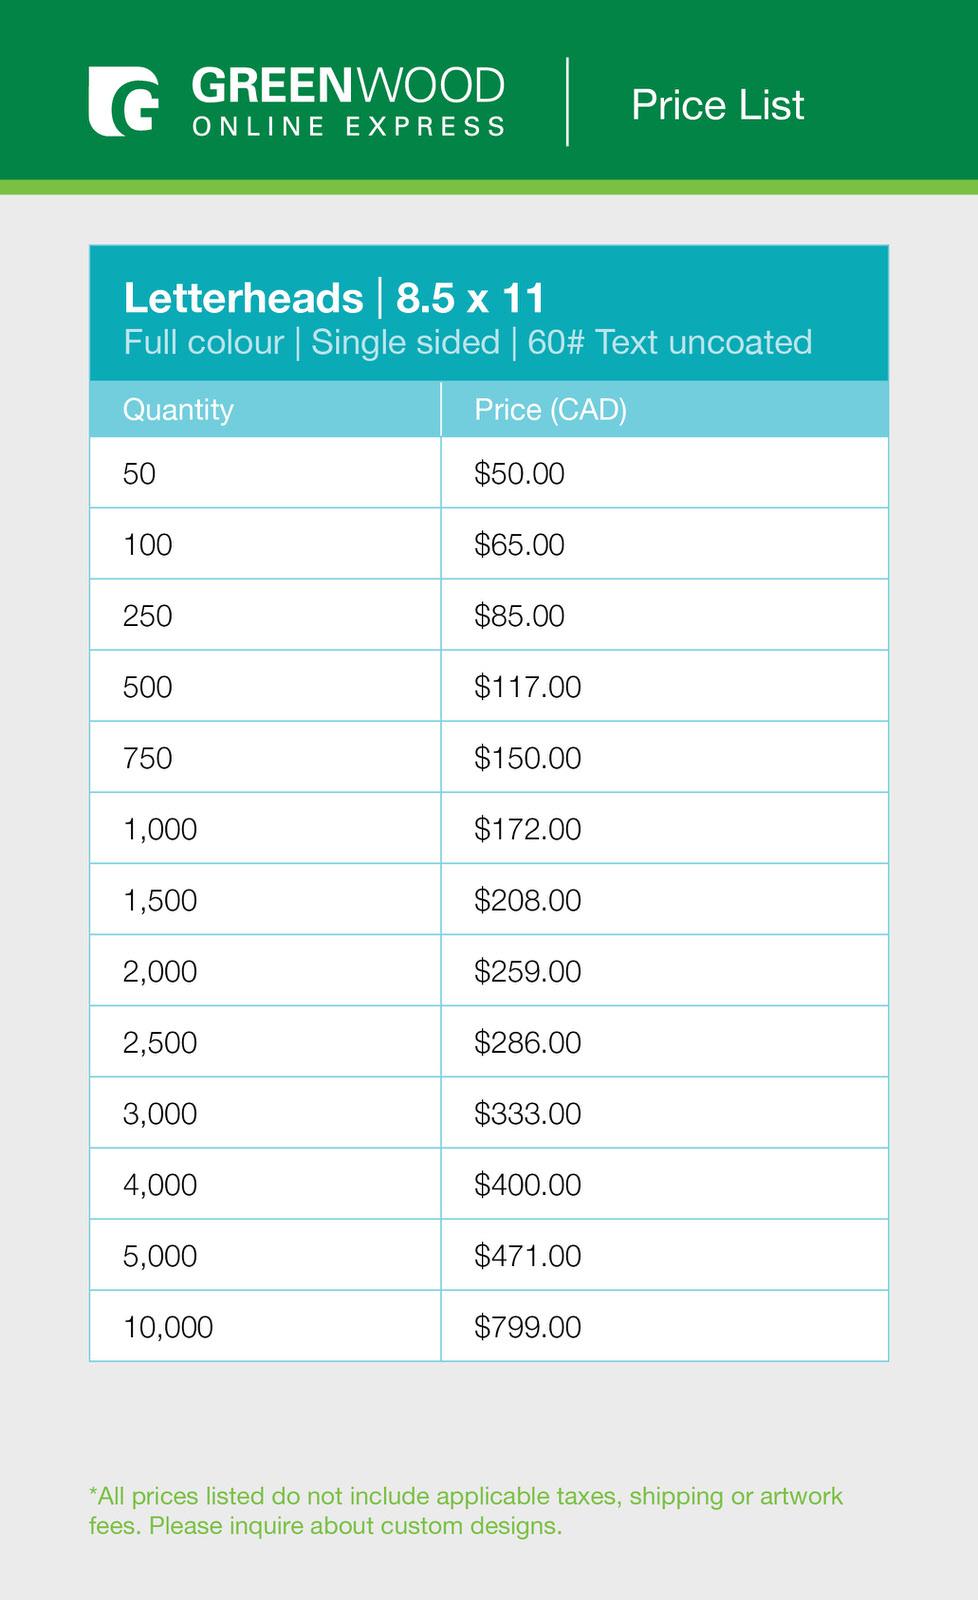 Greenwood letterheads price list.jpg